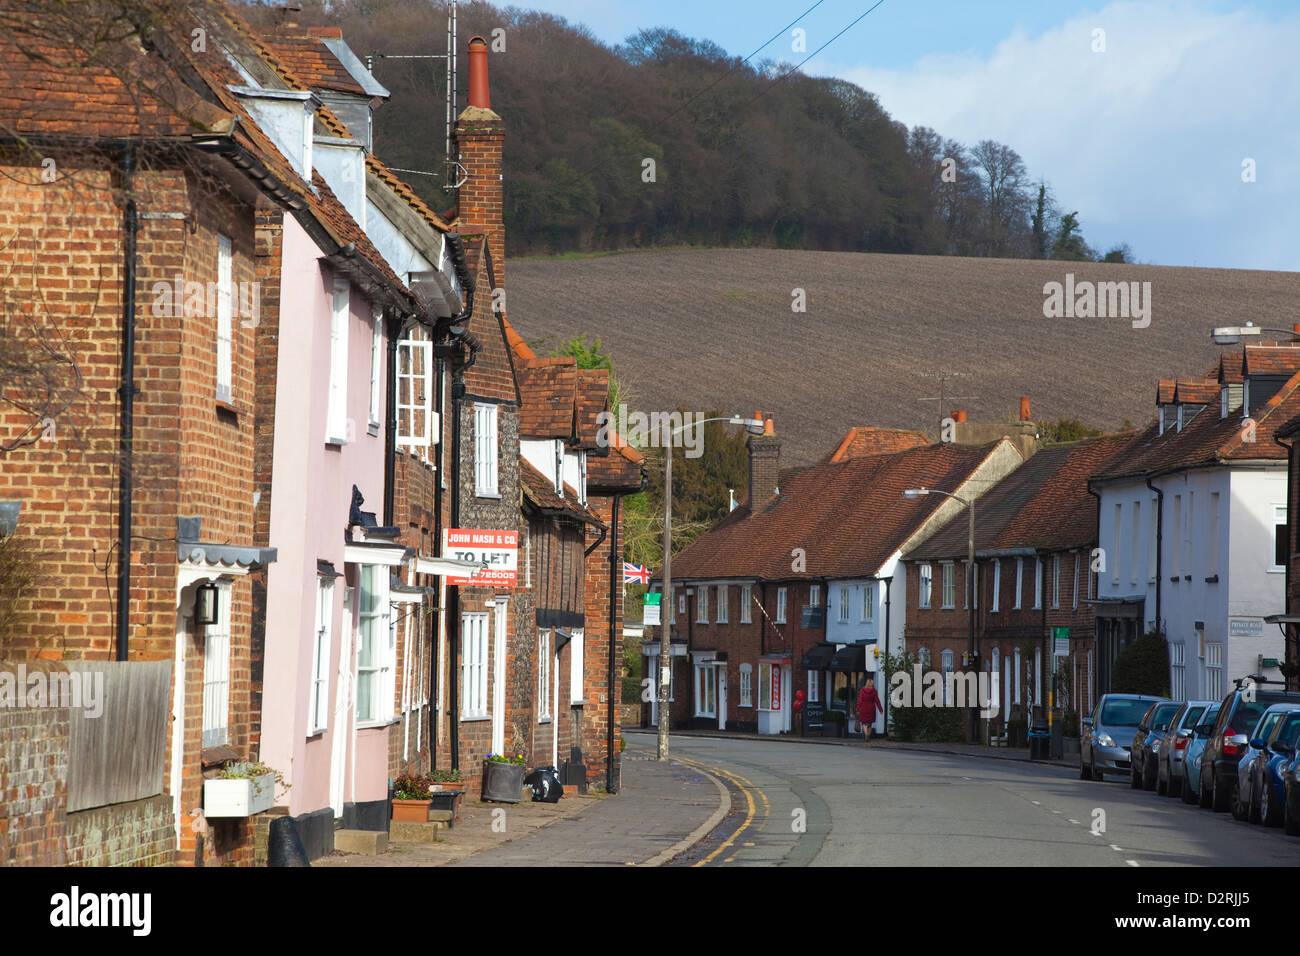 Houses along Whielden Street, Old Amersham, the Chilterns, Buckinghamshire, England, UK - Stock Image